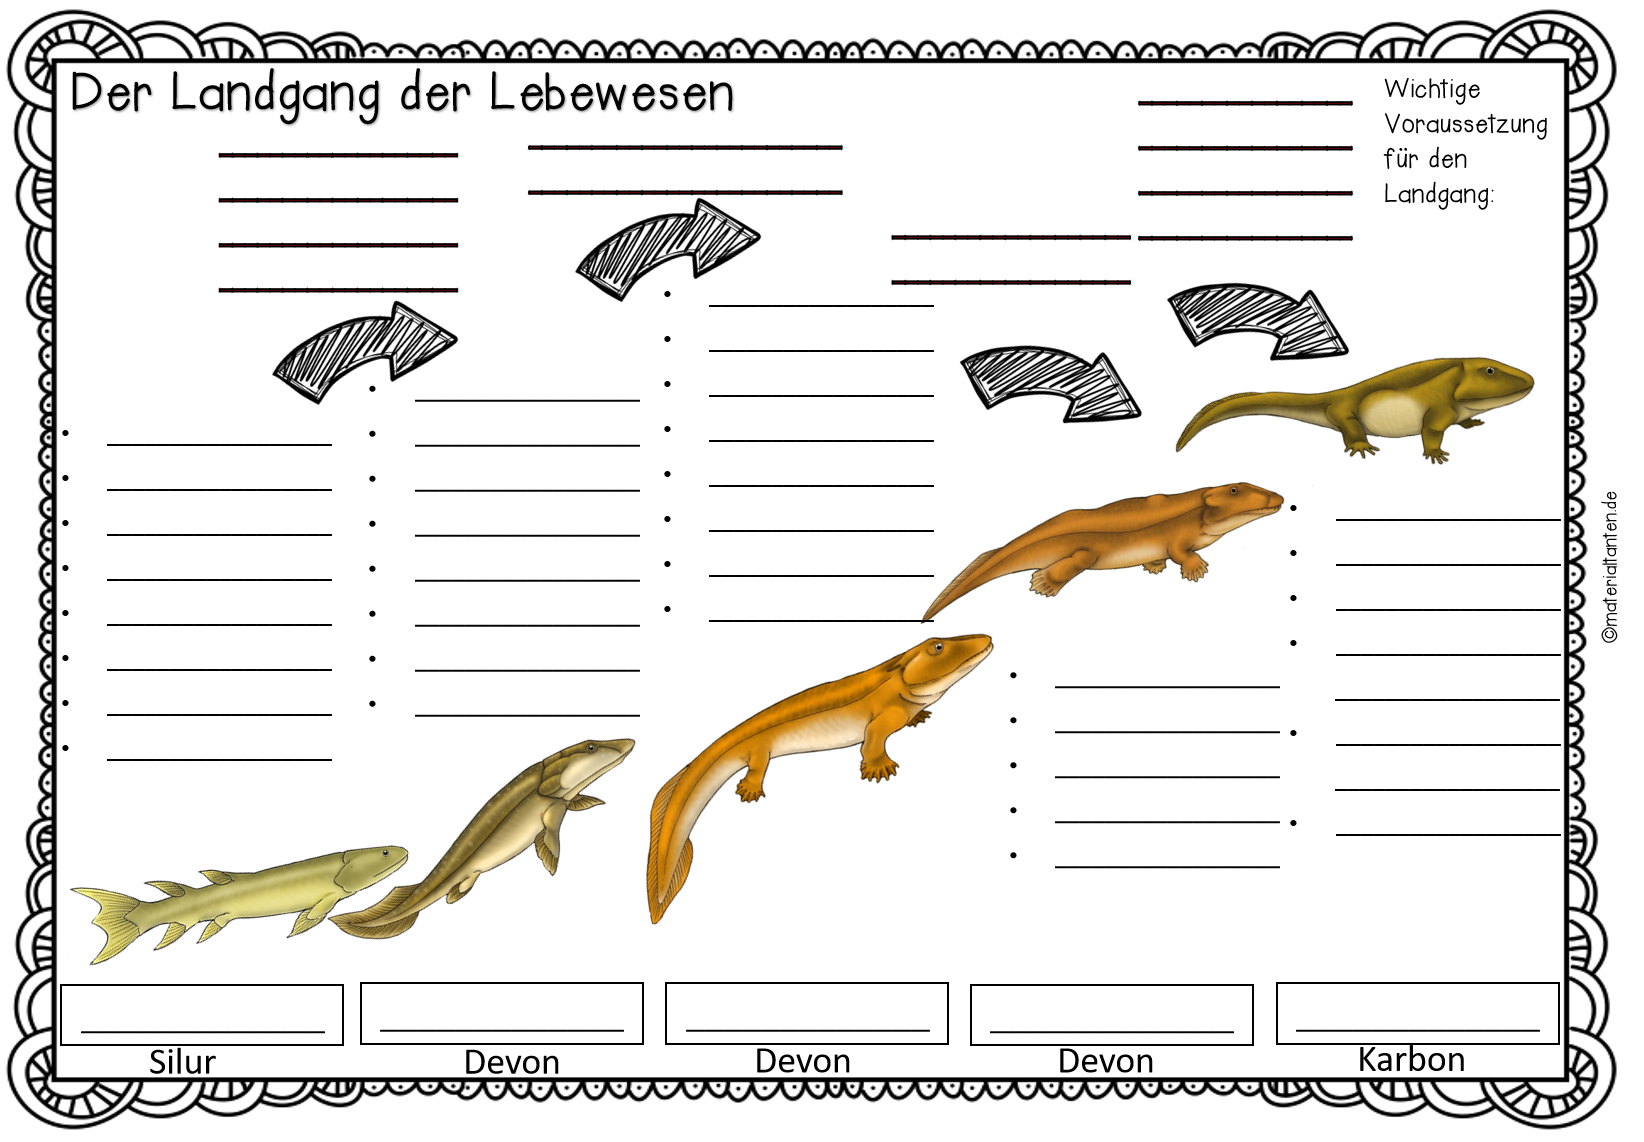 Evolution Stunde 2: Der Landgang der Lebewesen - Materialtanten